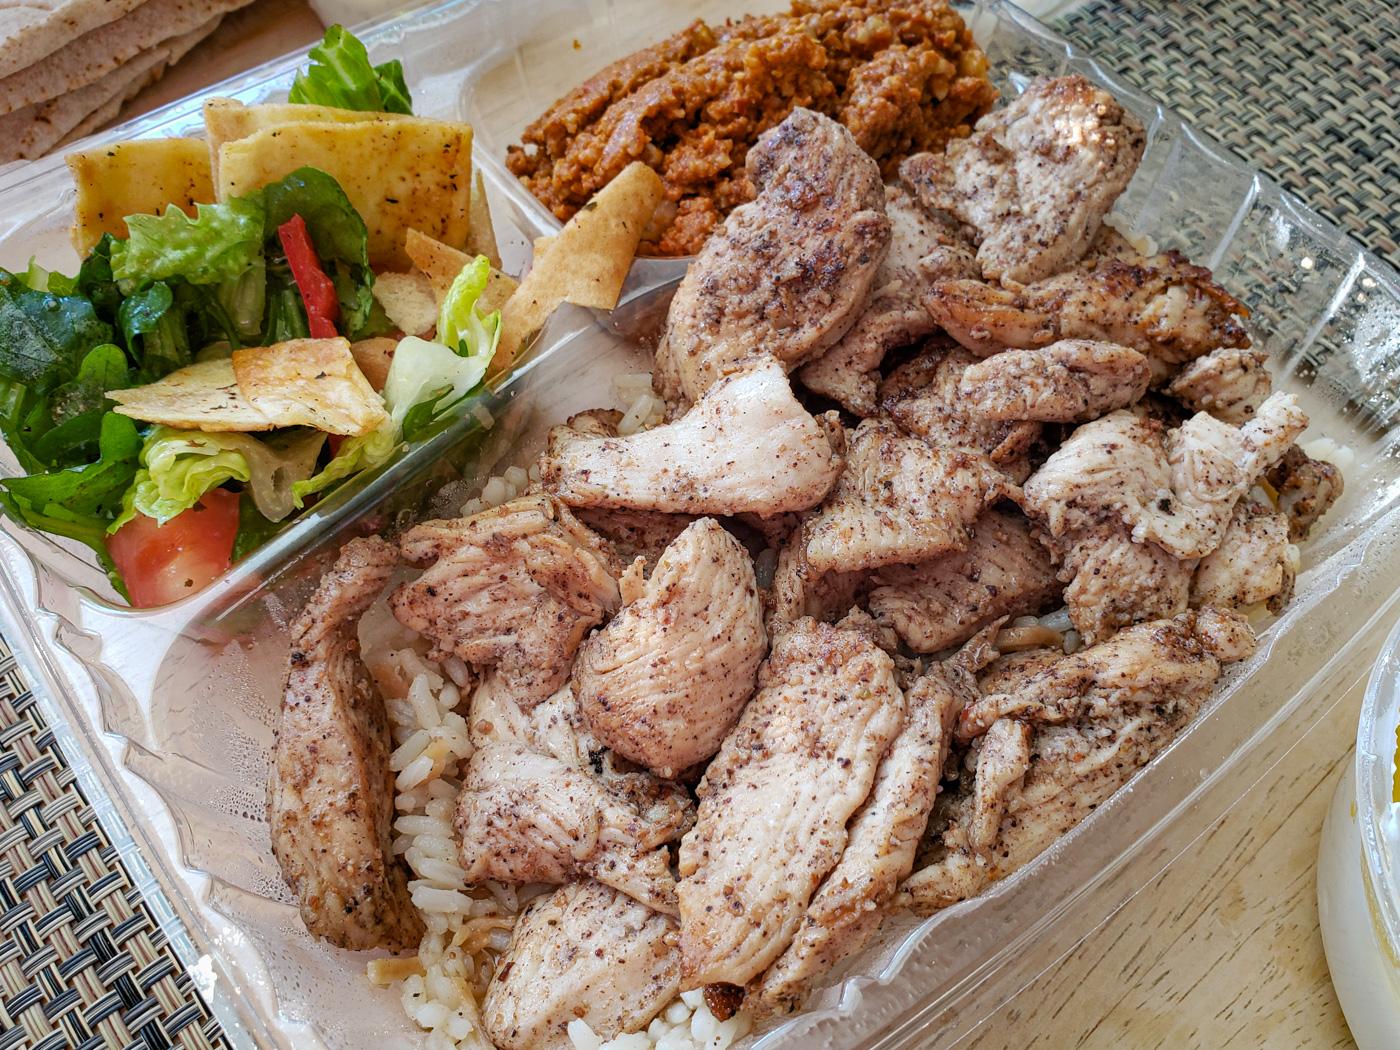 Chicken Shawarma, Fattoush, and Muhamara from Apricot Stone